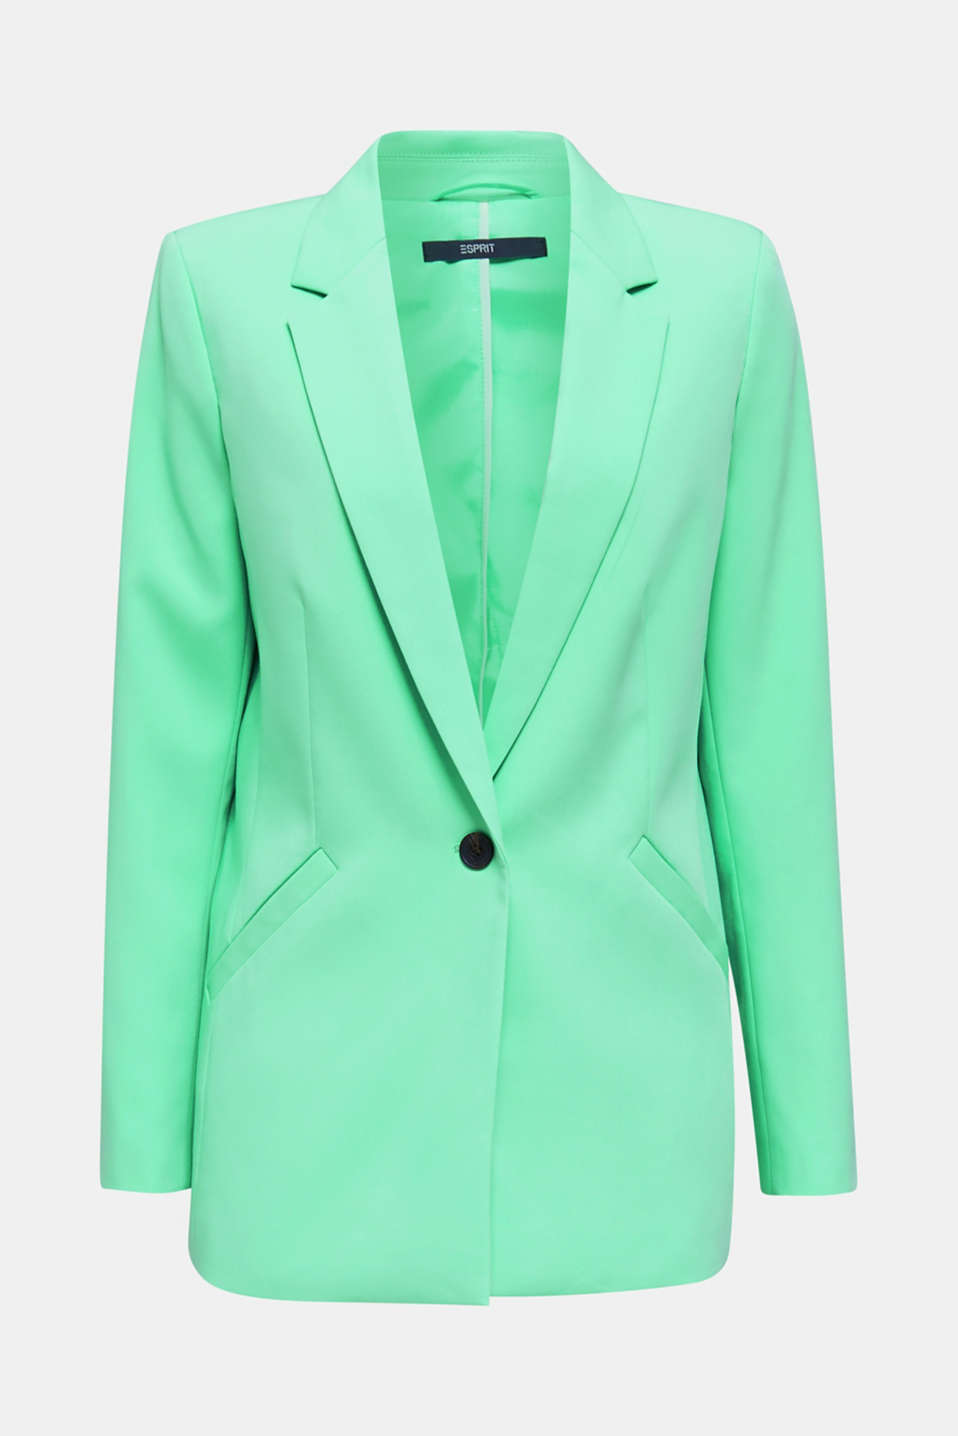 SHIMMER mix + match stretch blazer, LIGHT GREEN, detail image number 8